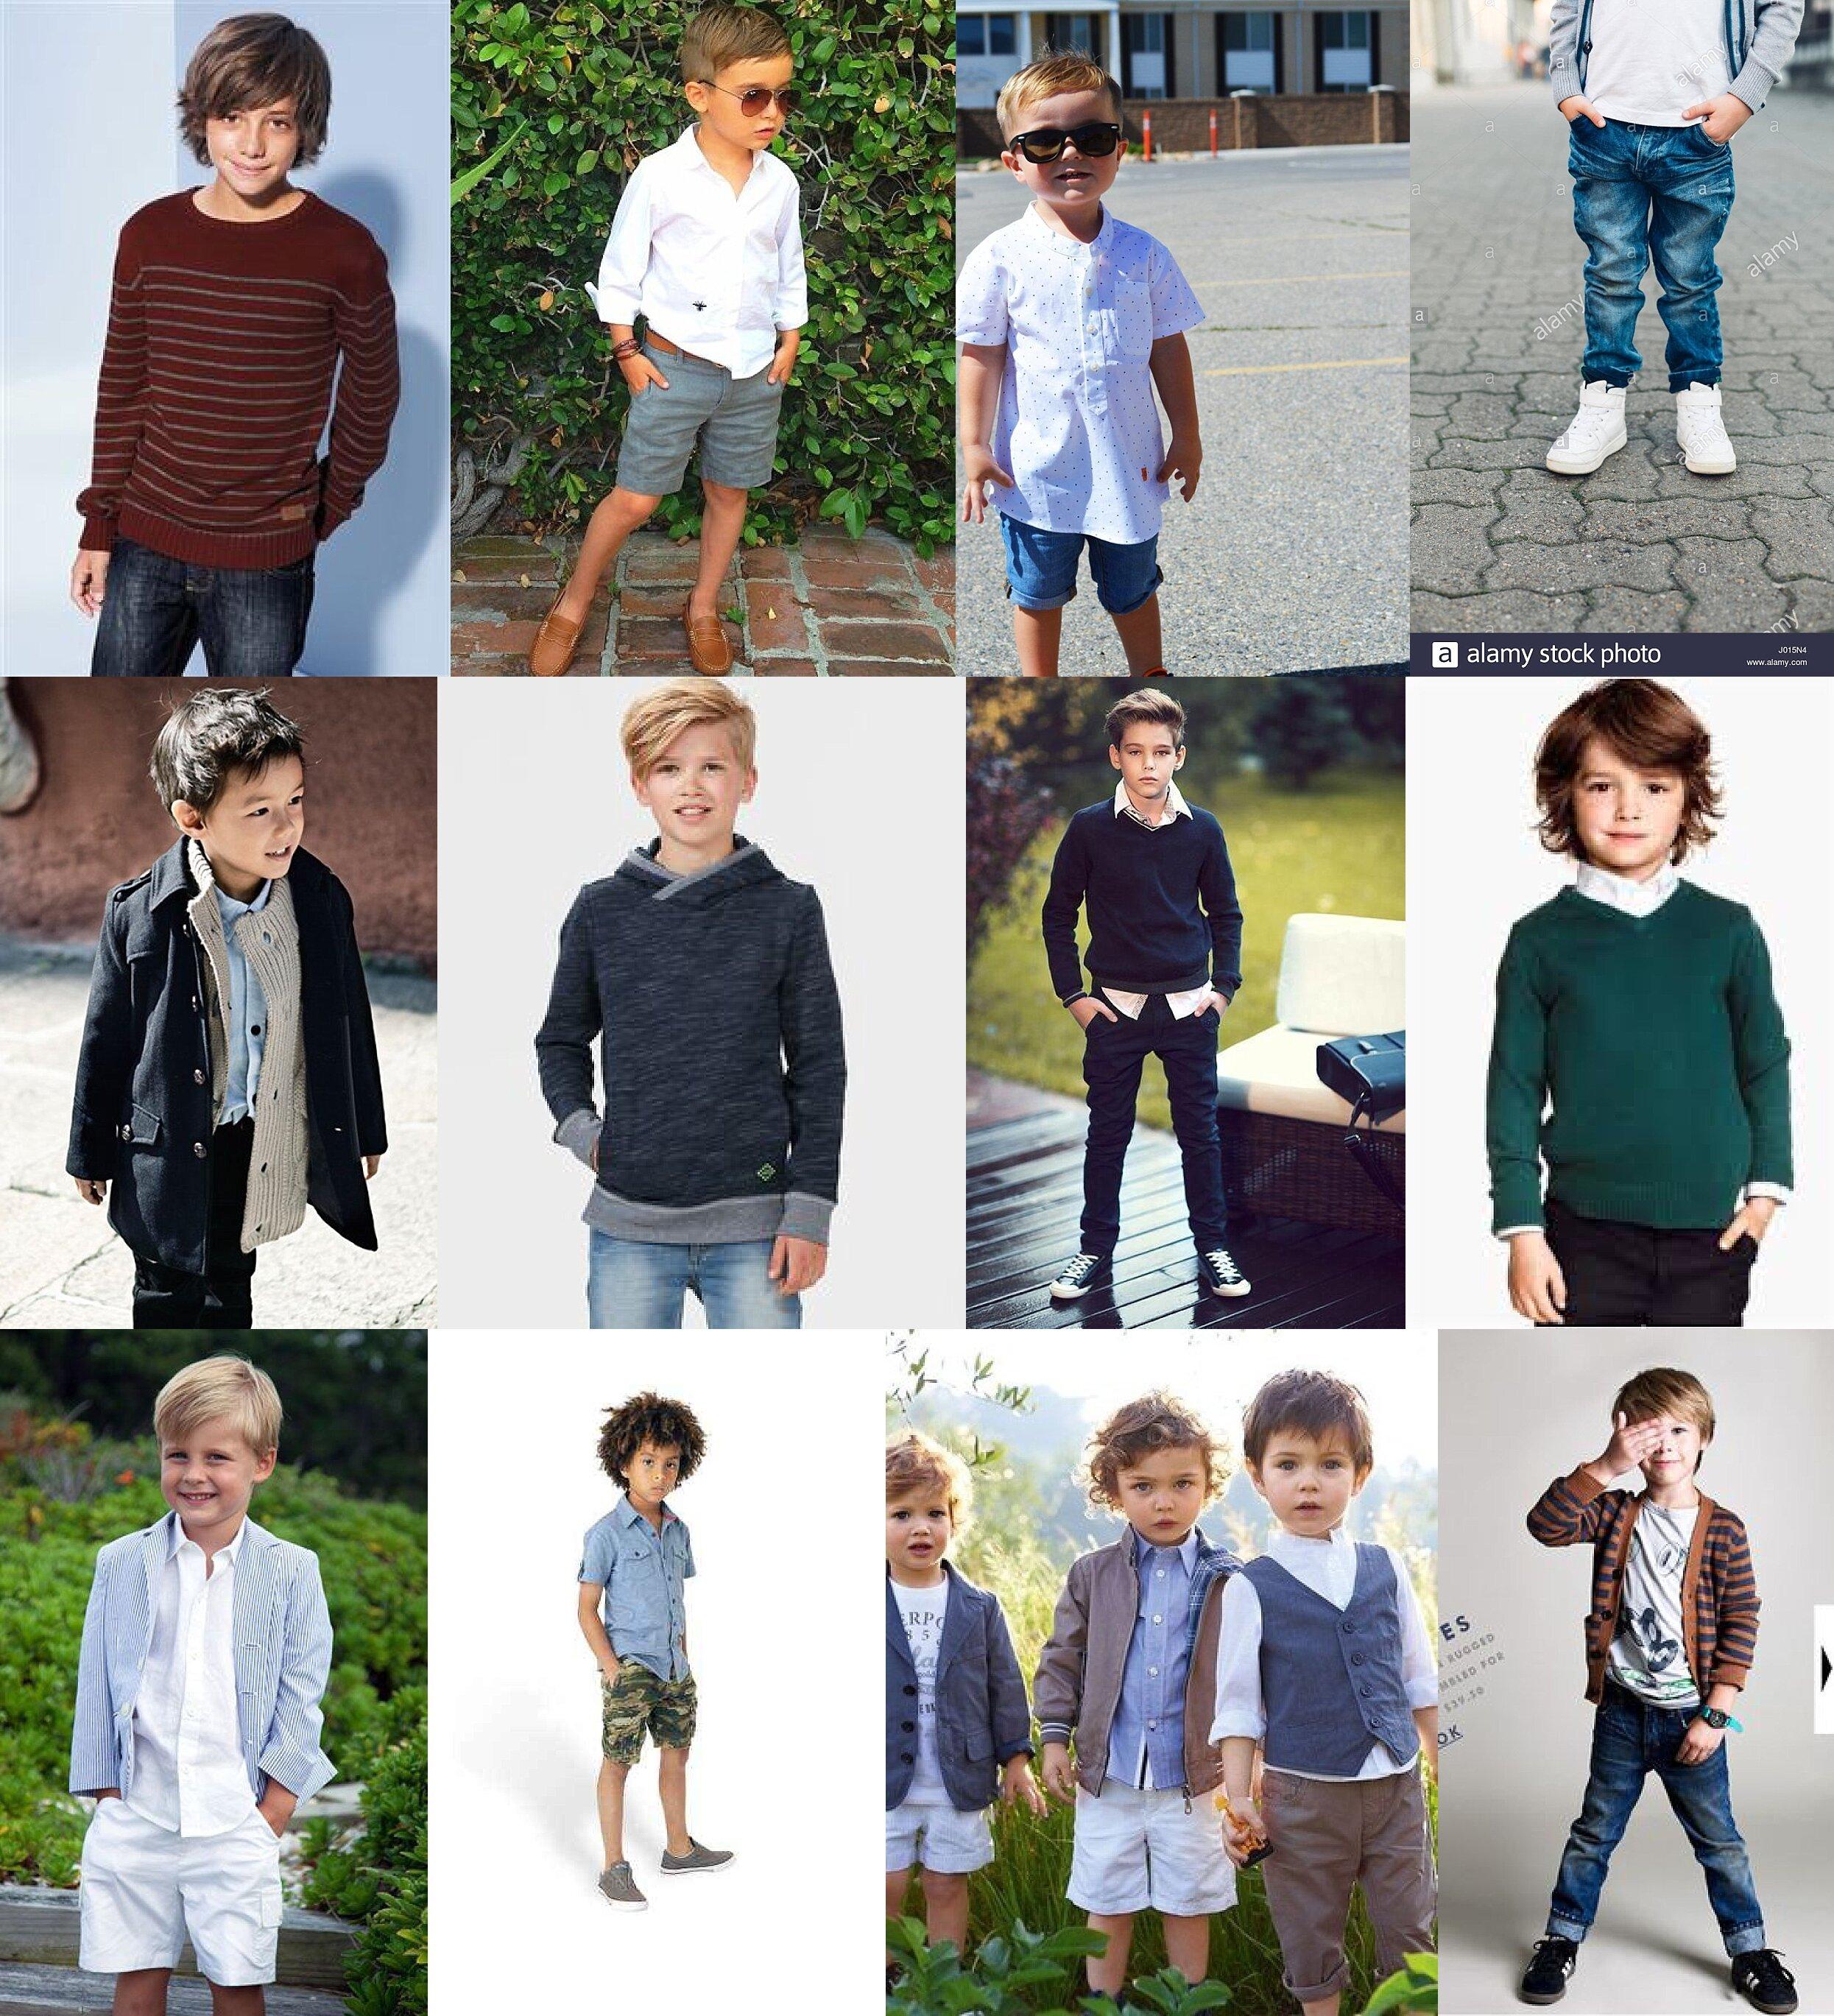 4. DRESS THE BOYS THE SAME AS YOU DO THE MEN